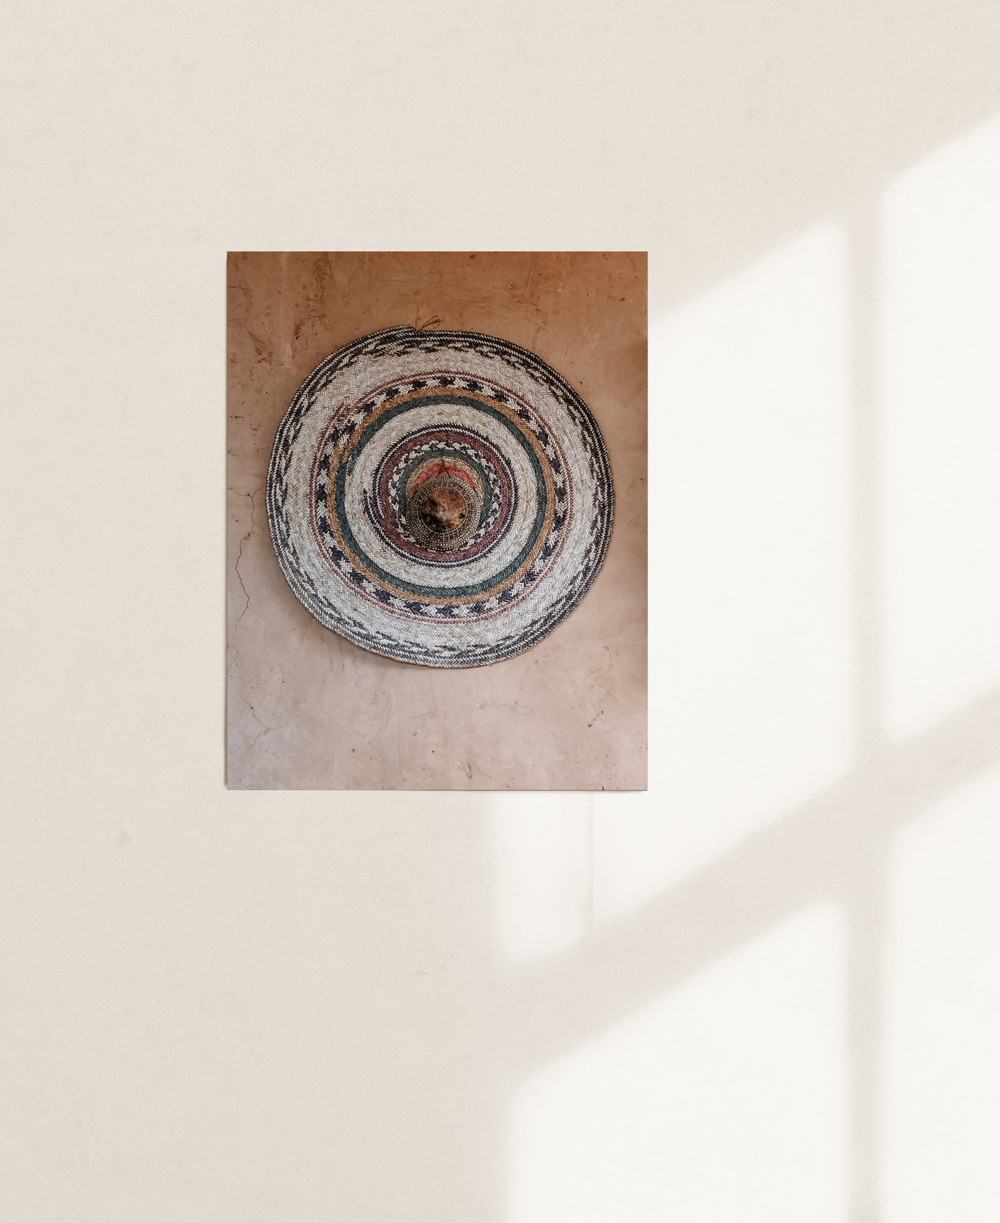 nicischwab-prints-02-008